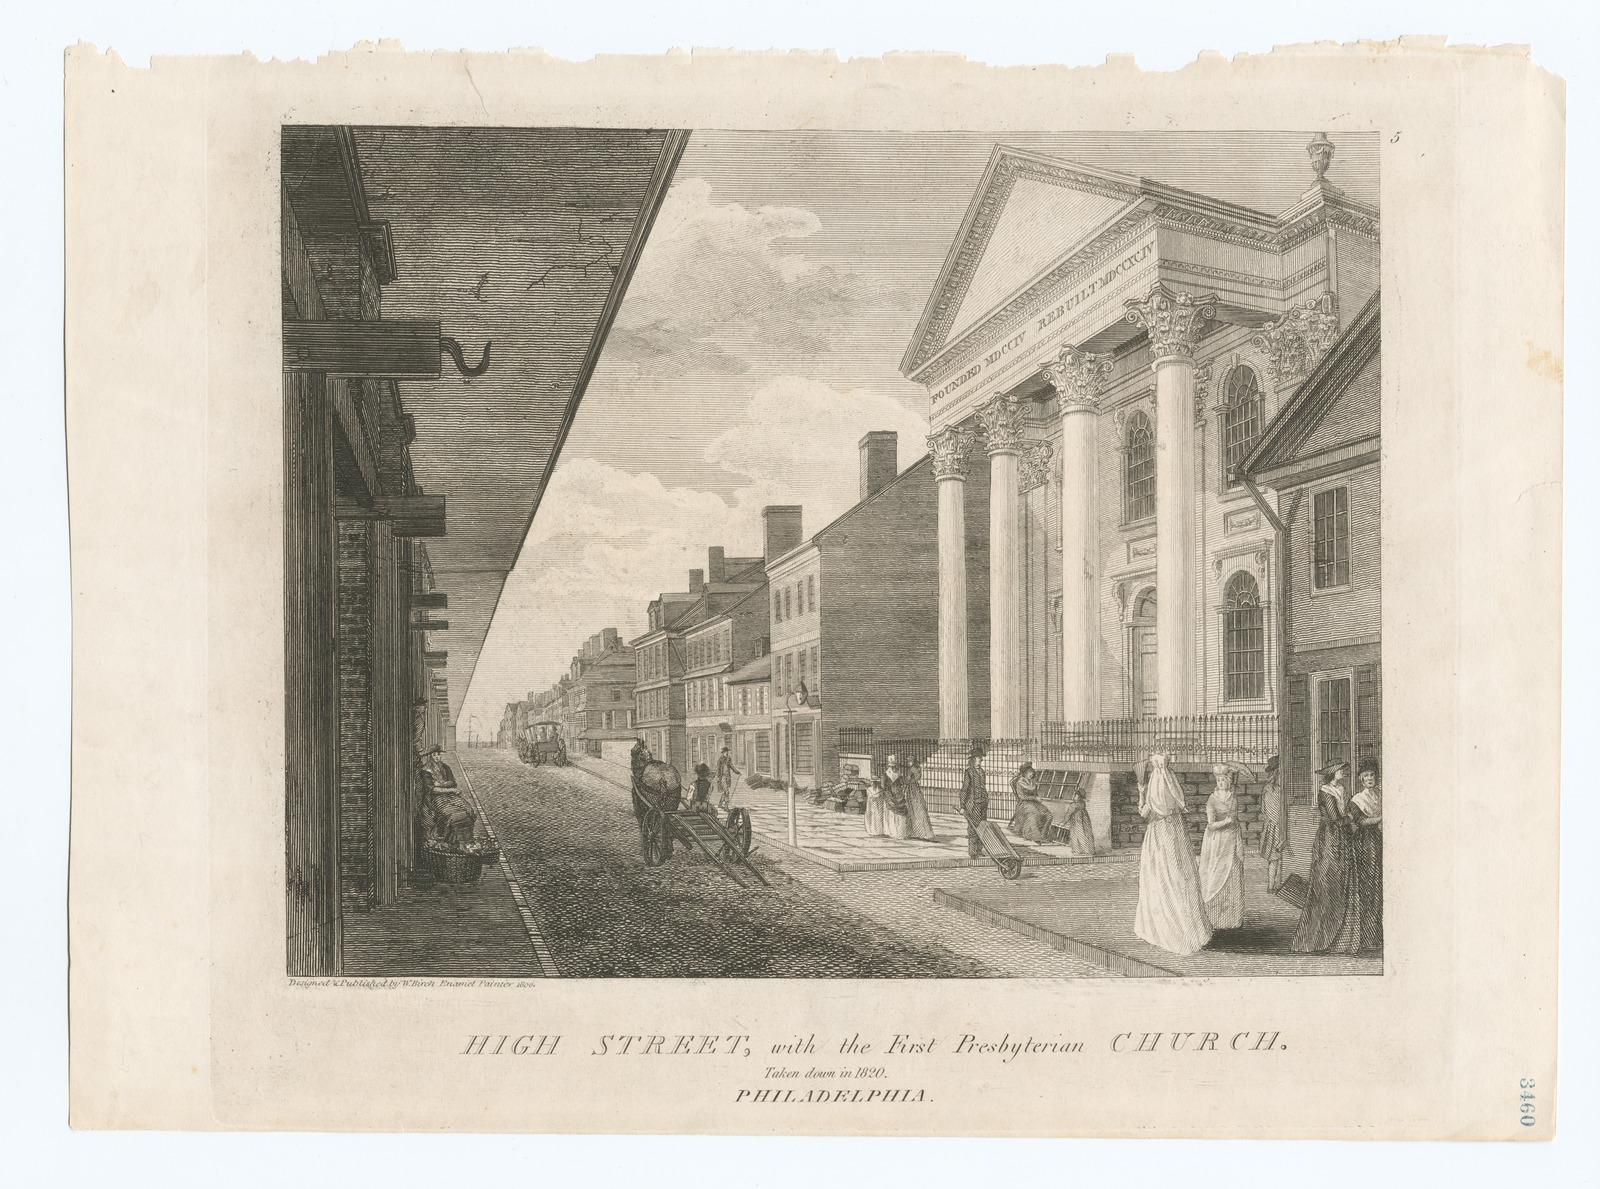 High Street, with the First Presbyterian Church.